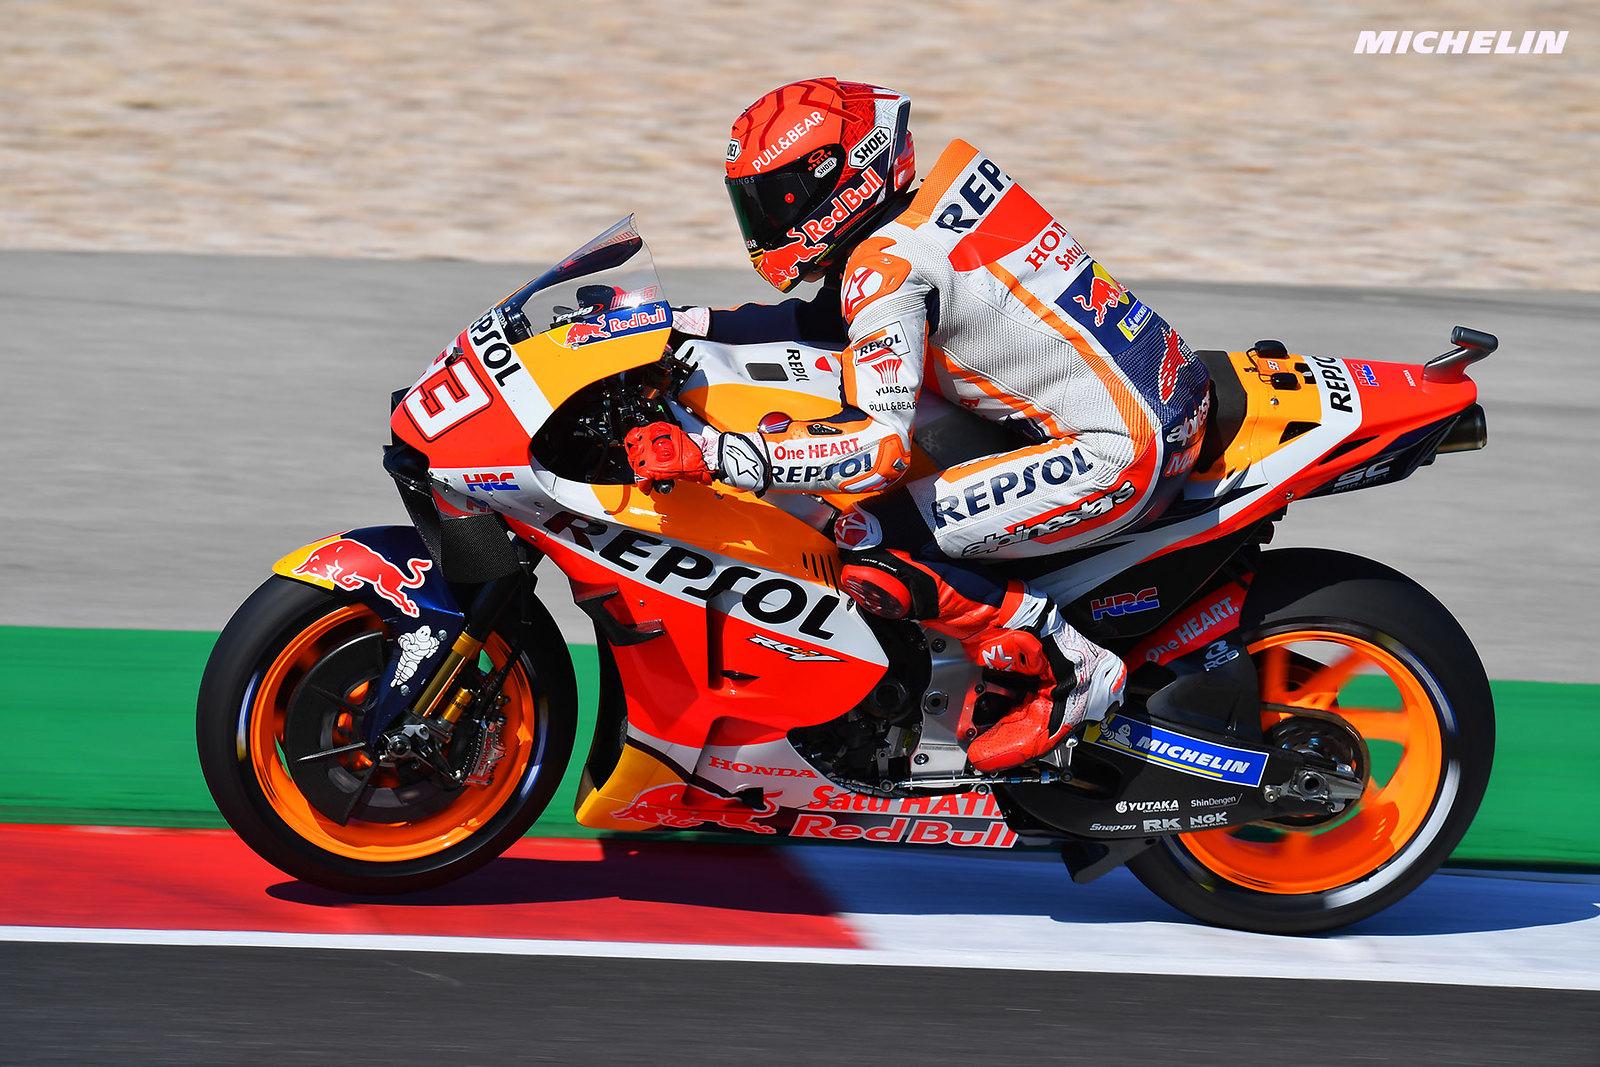 MotoGP2021 ポルトガルGP 予選6位マルク・マルケス「何かを学ぶならチャンピオンから学ぶのが一番」